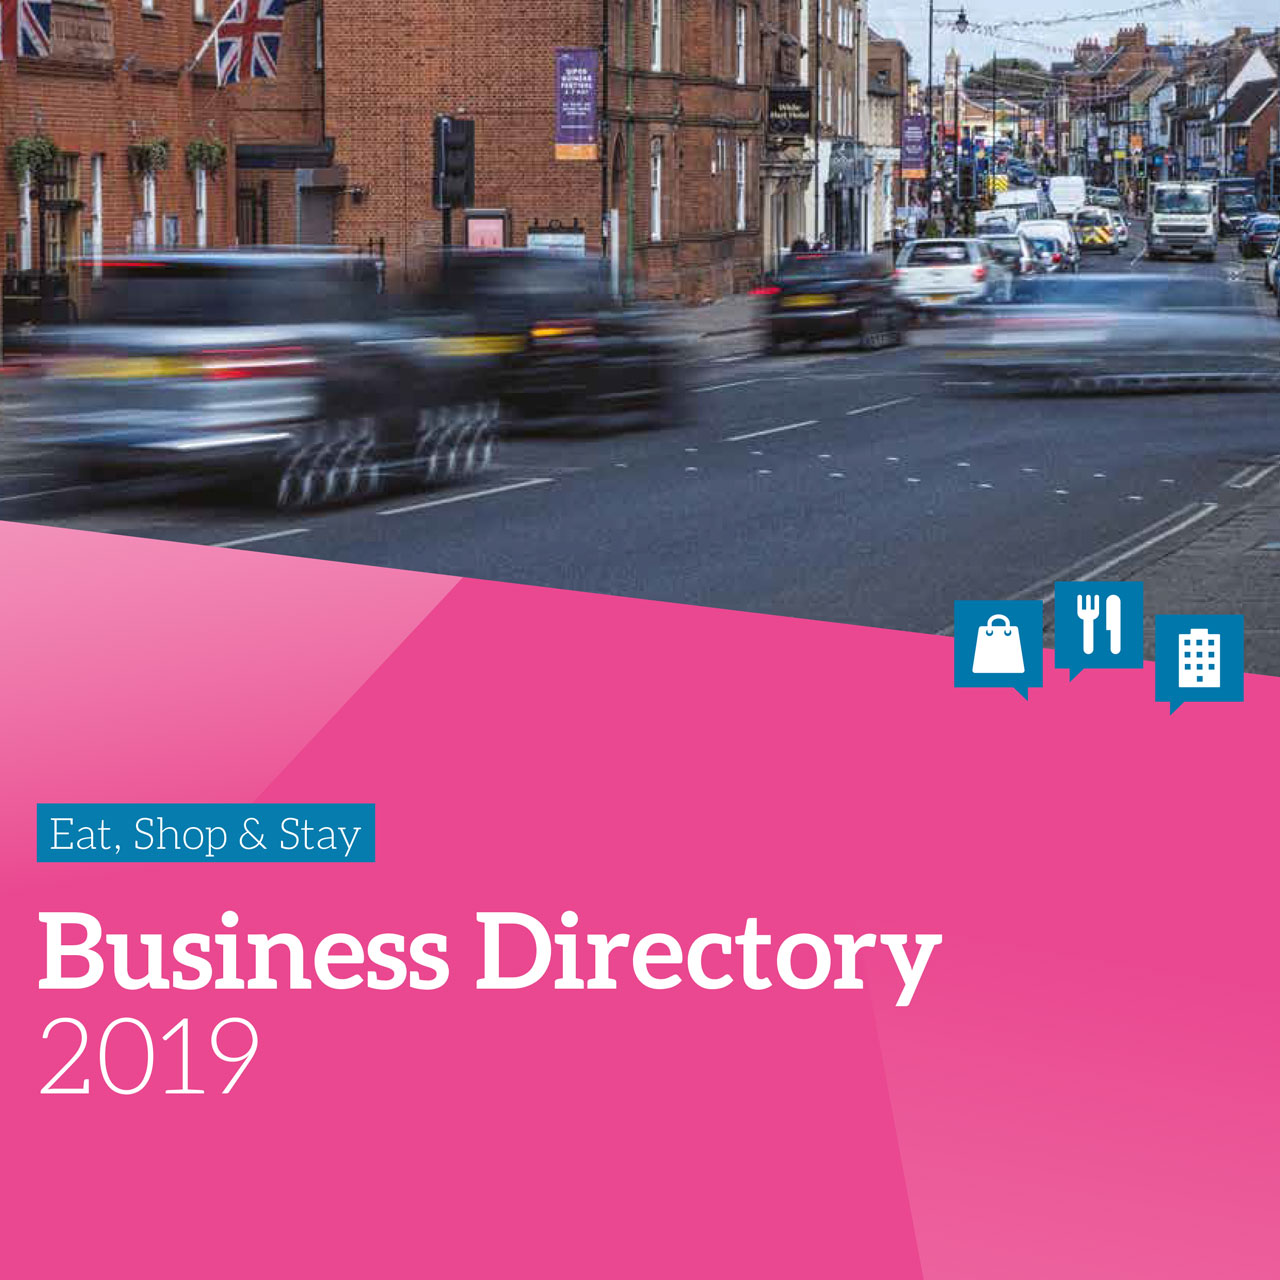 BID Business Directory 2019-2020